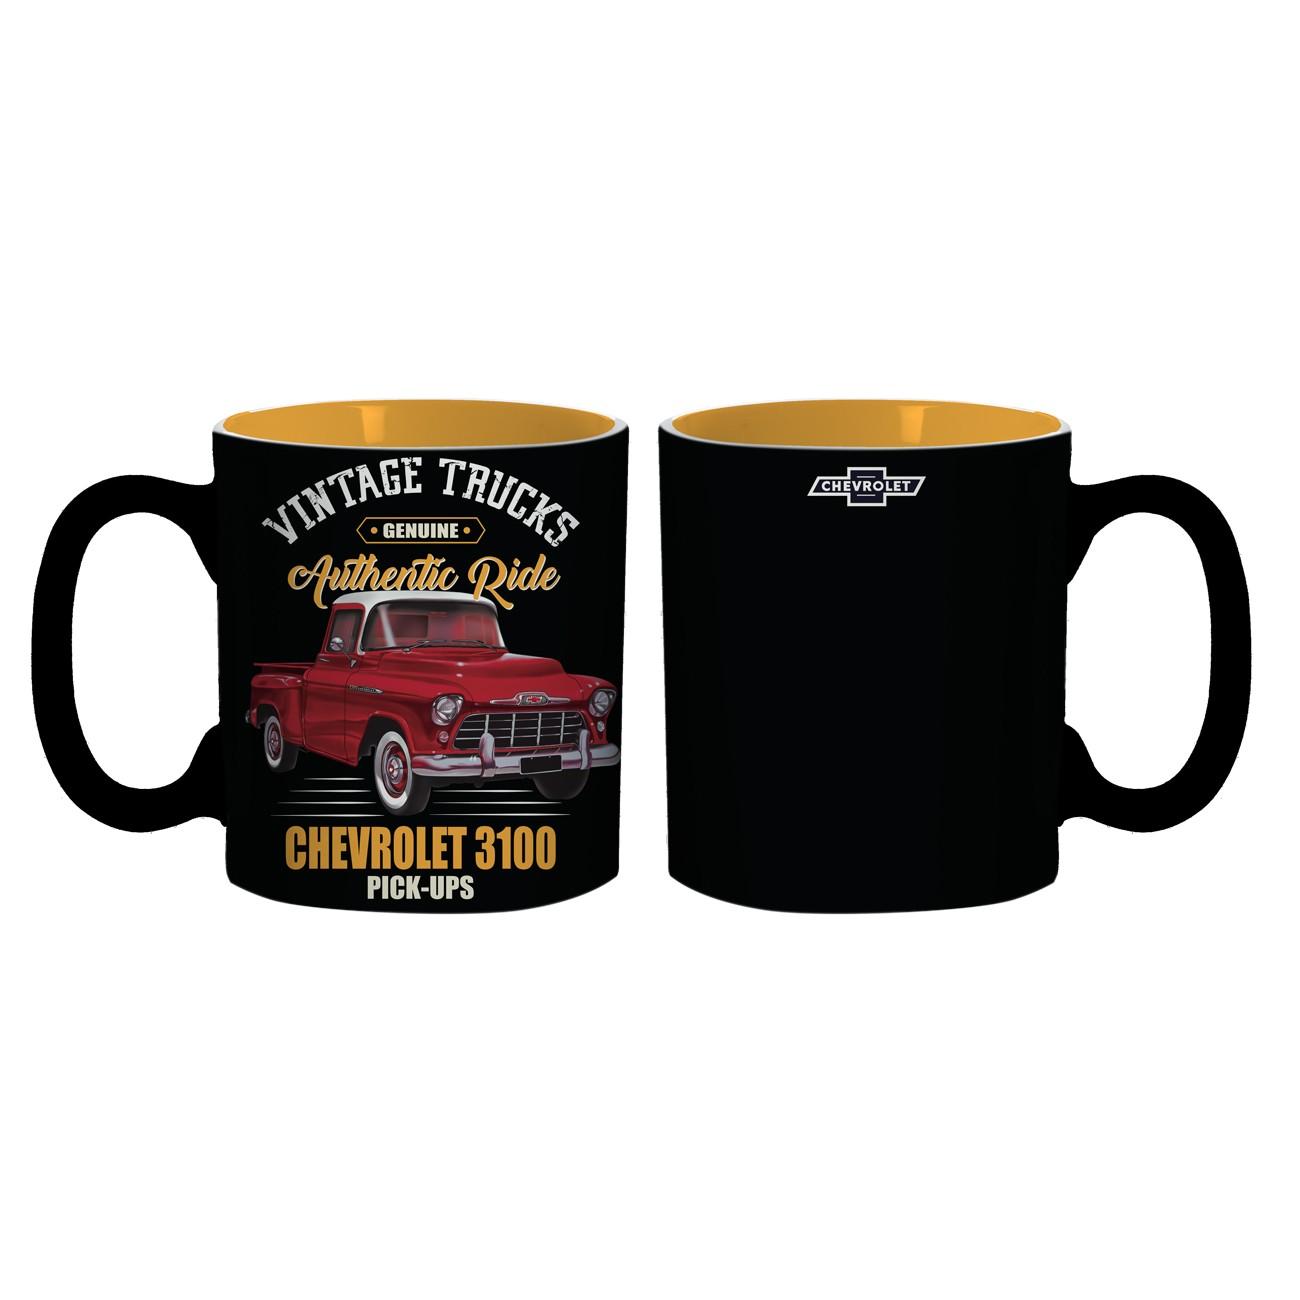 Caneca Chevrolet - Vintage Trucks - 3100 - Preto / Amarelo - 300 ml